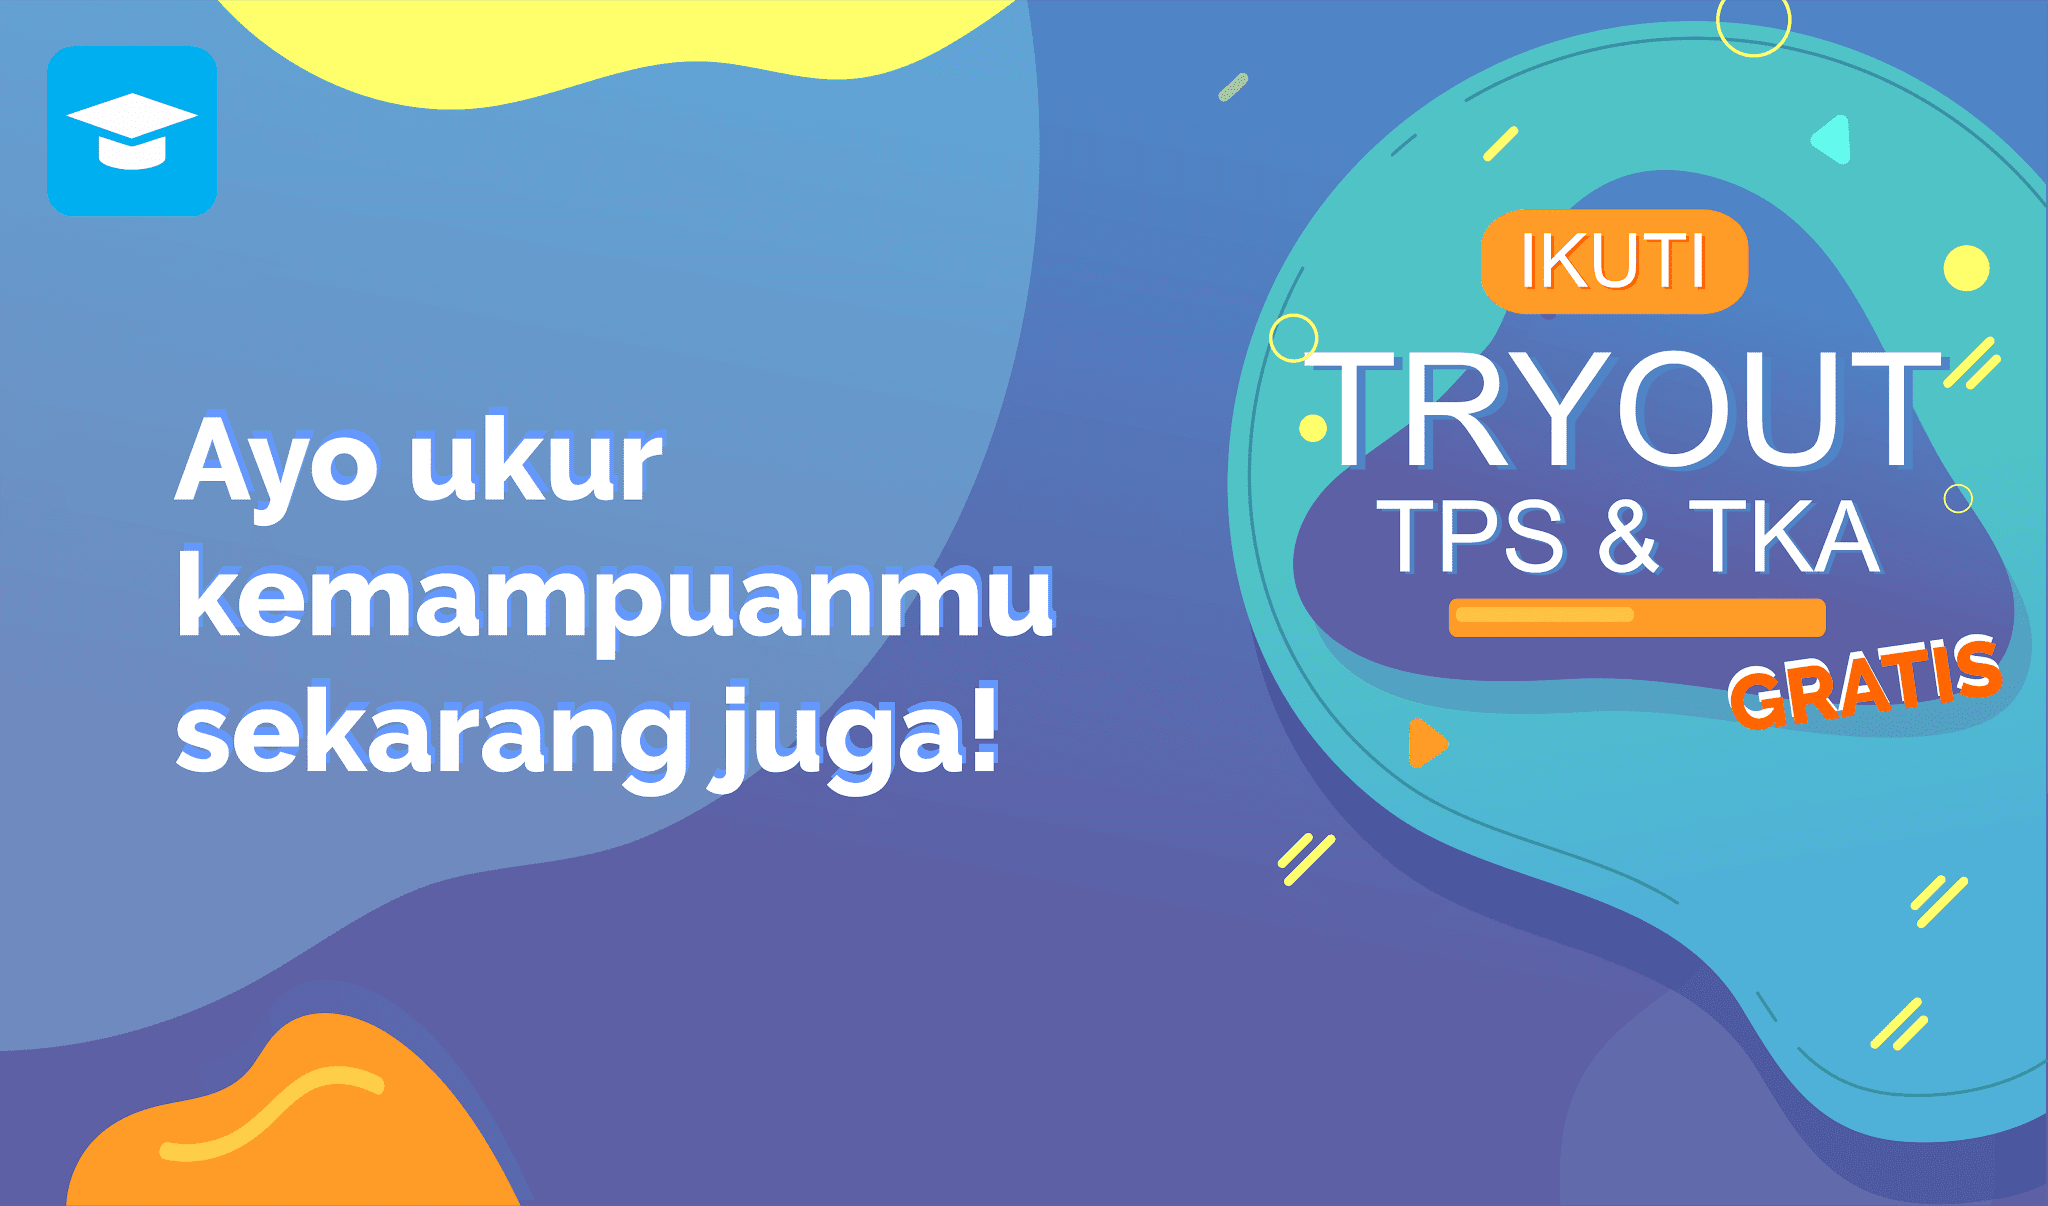 Tryout TPS dan TKA Gratis